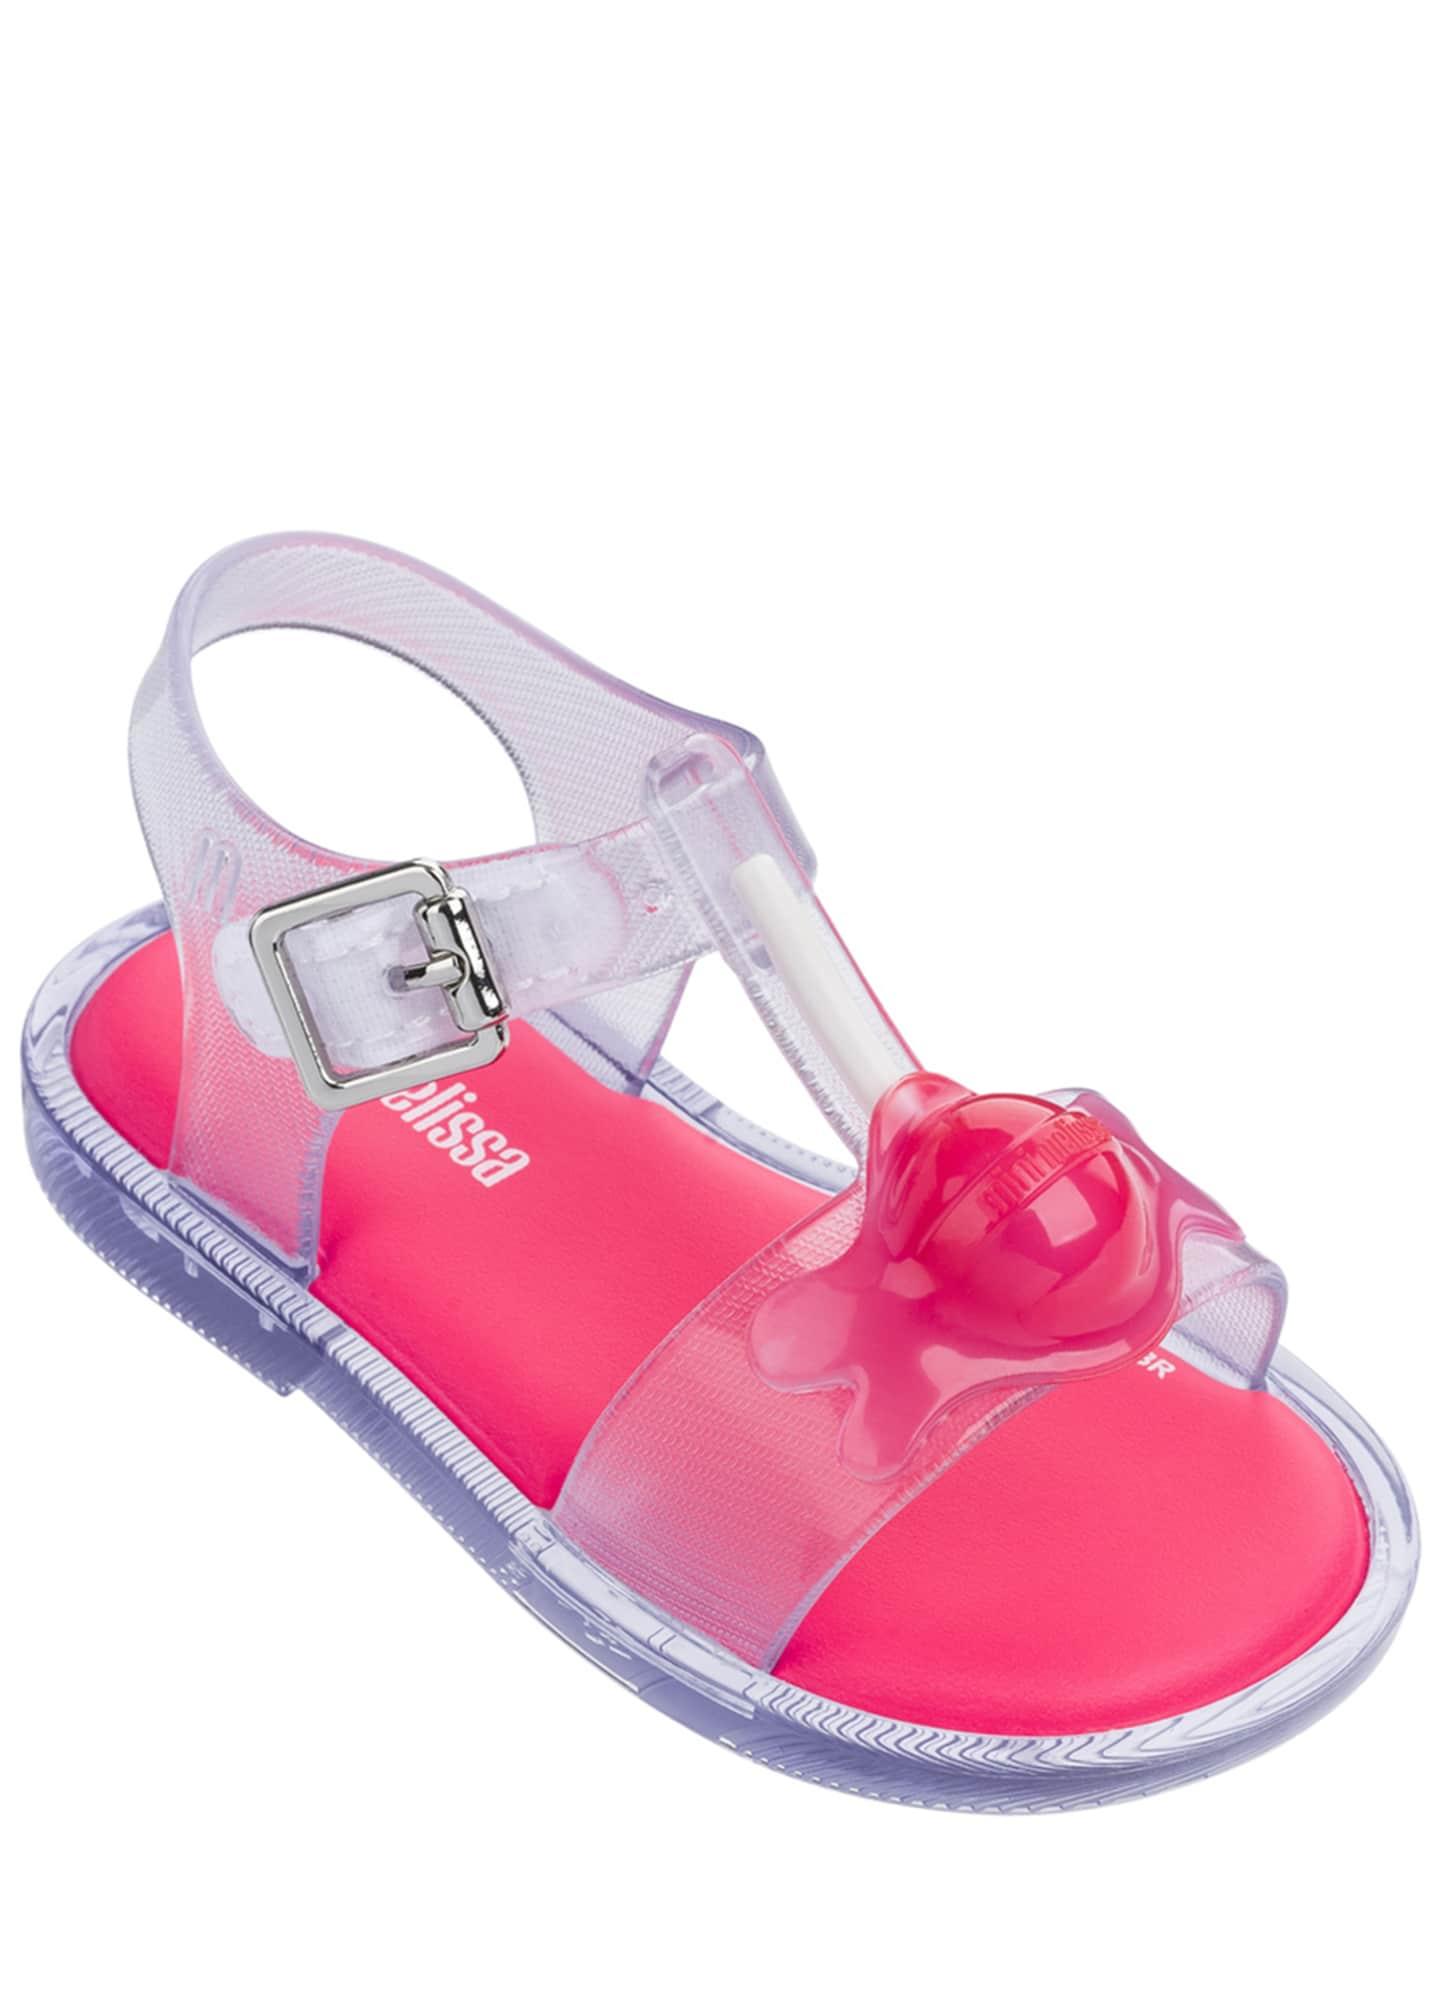 Mini Melissa Mar II Melting Sucker T-Strap Sandal,